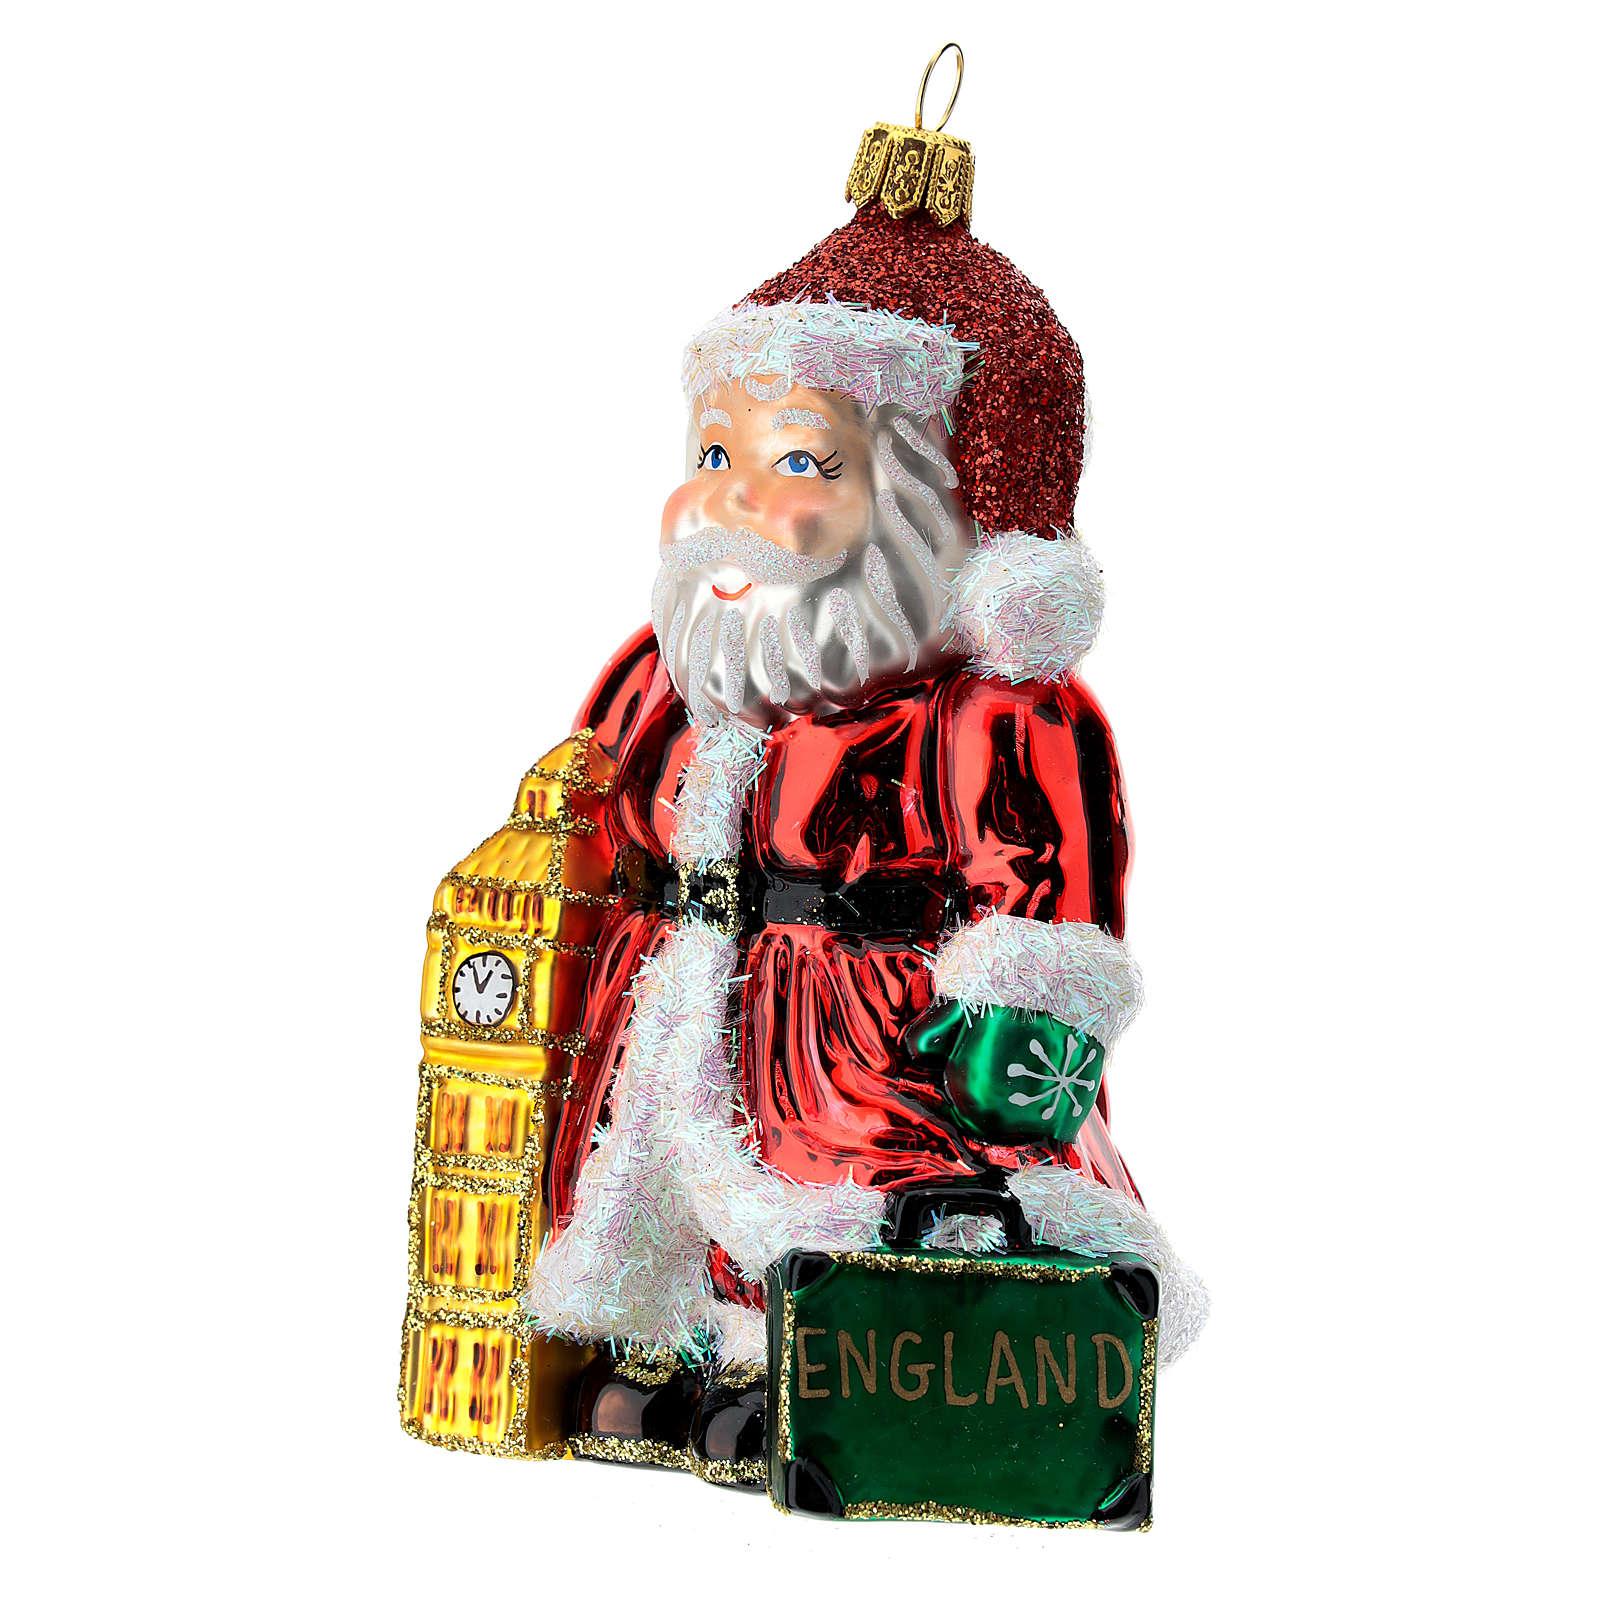 Blown glass Christmas ornament, Santa Claus in England 4